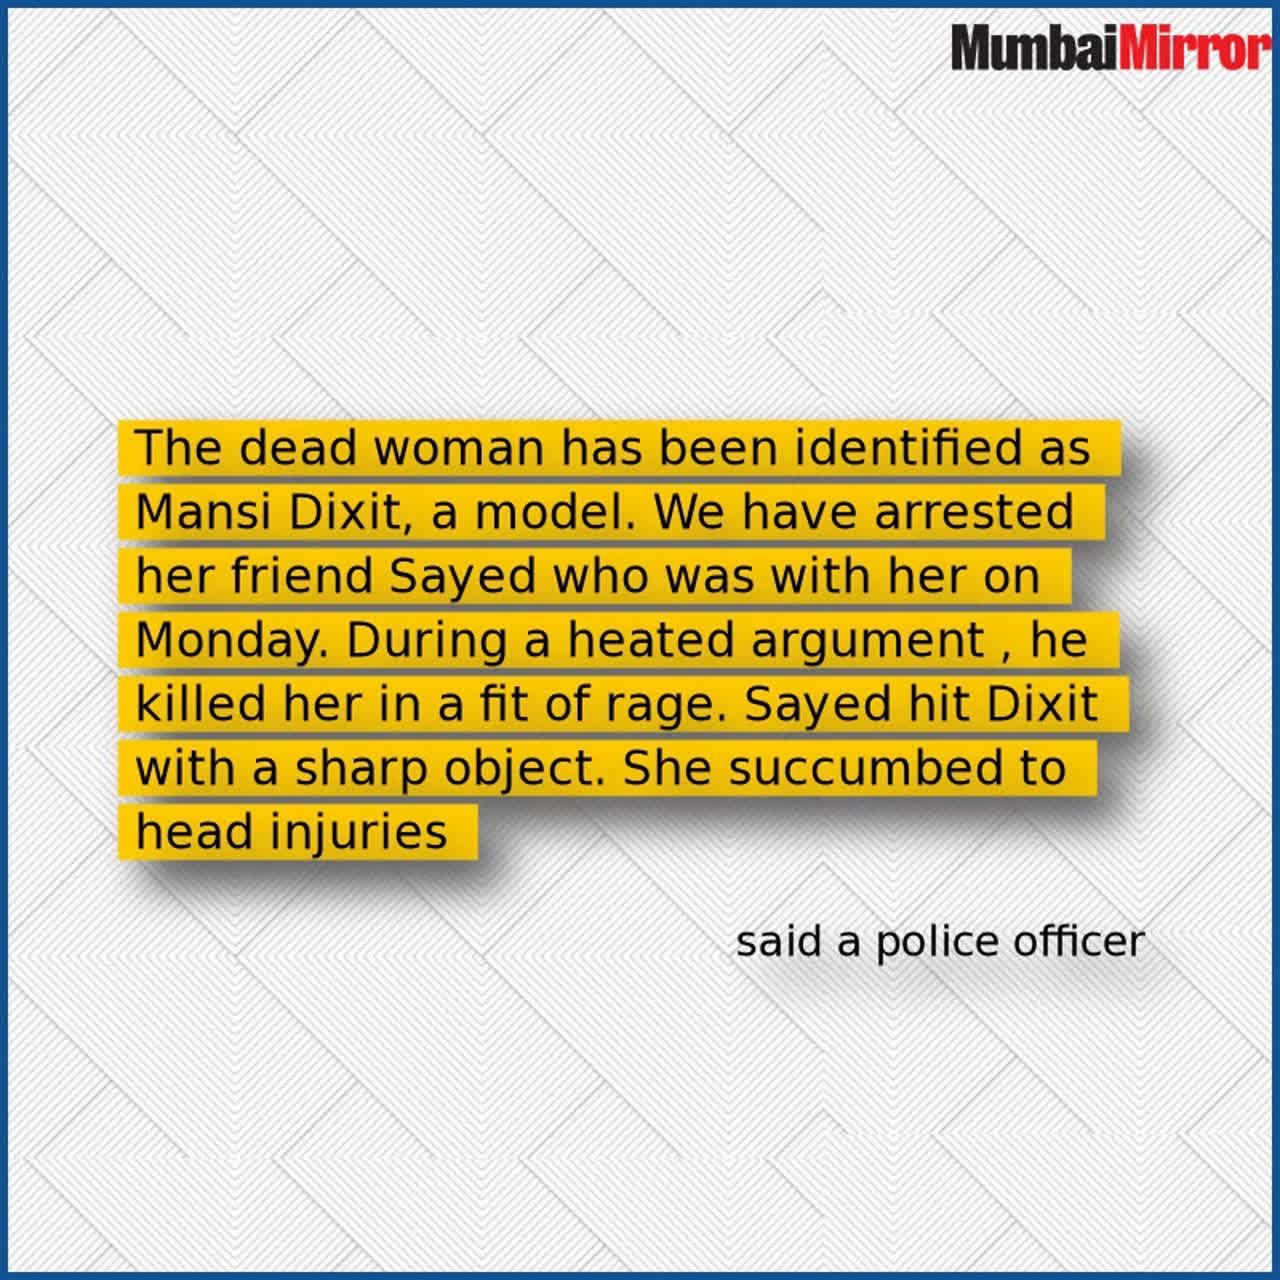 Mumbai Model Murder 20 Year Old Arrested For Killing Mansi Dixit Stuffing